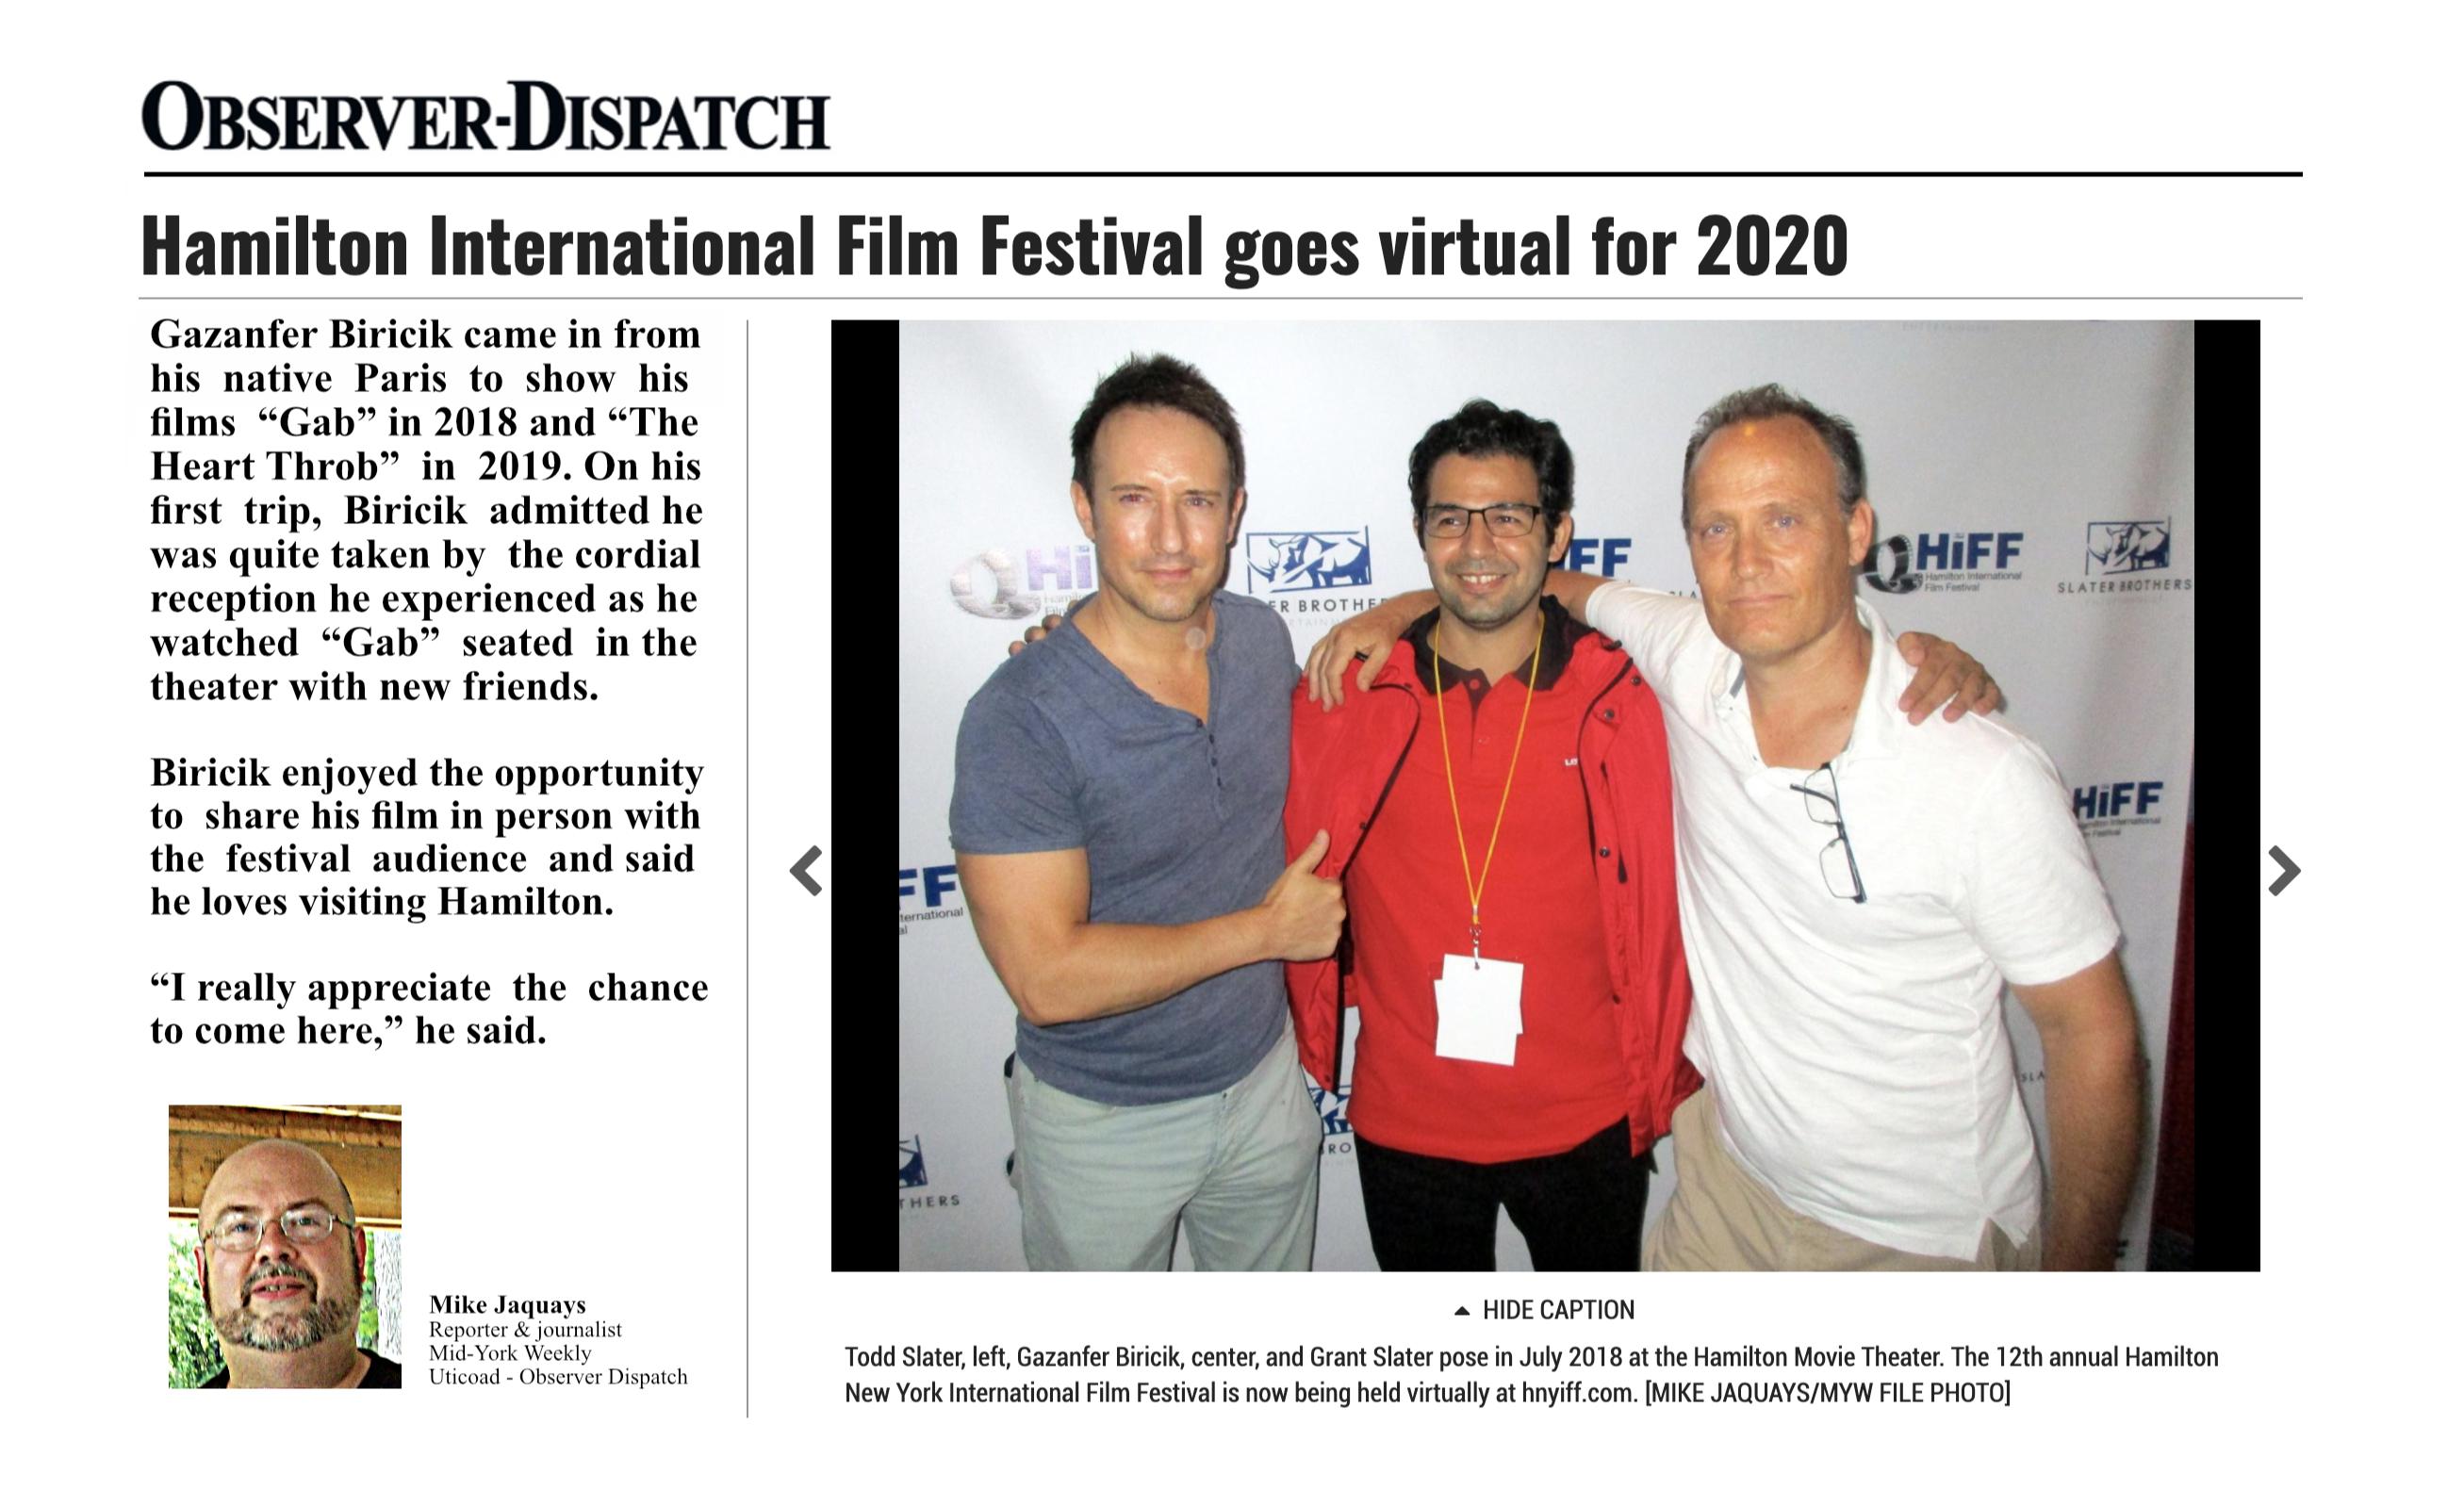 Observer-Dispatch talks about Gazanfer BIRICIK